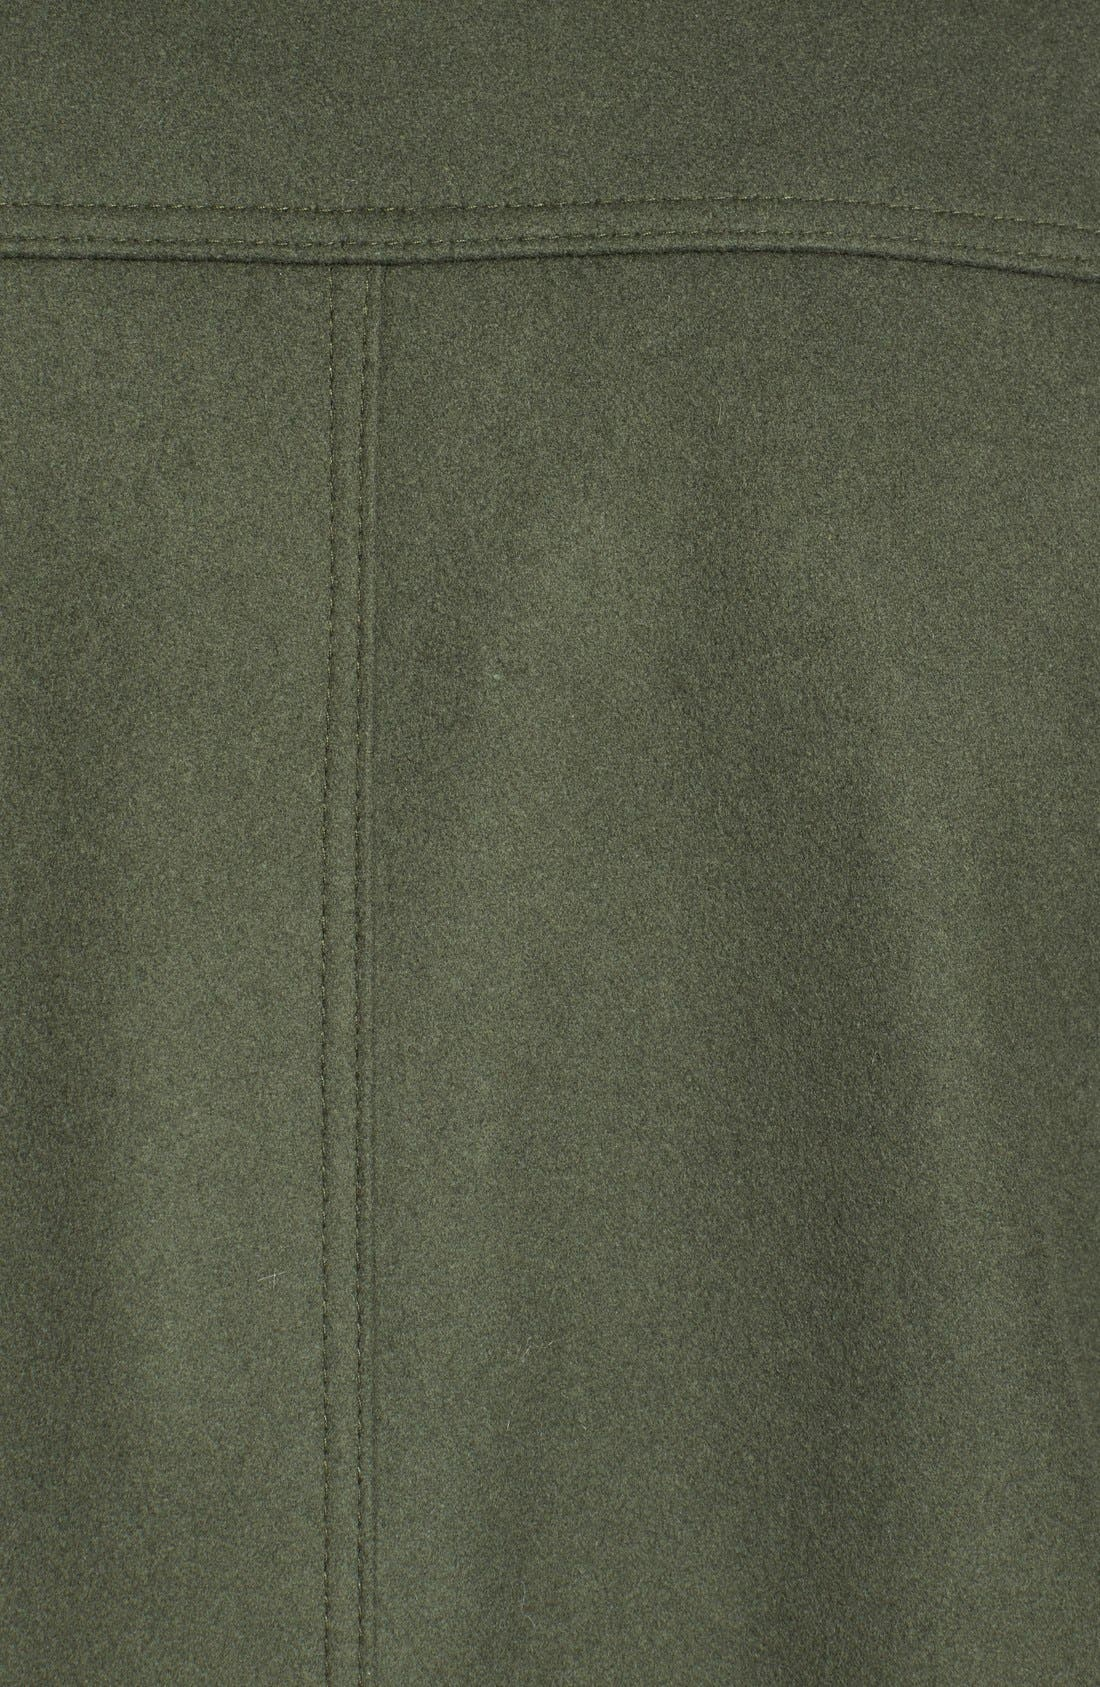 Funnel Neck Wool Blend Coat,                             Alternate thumbnail 6, color,                             Moss